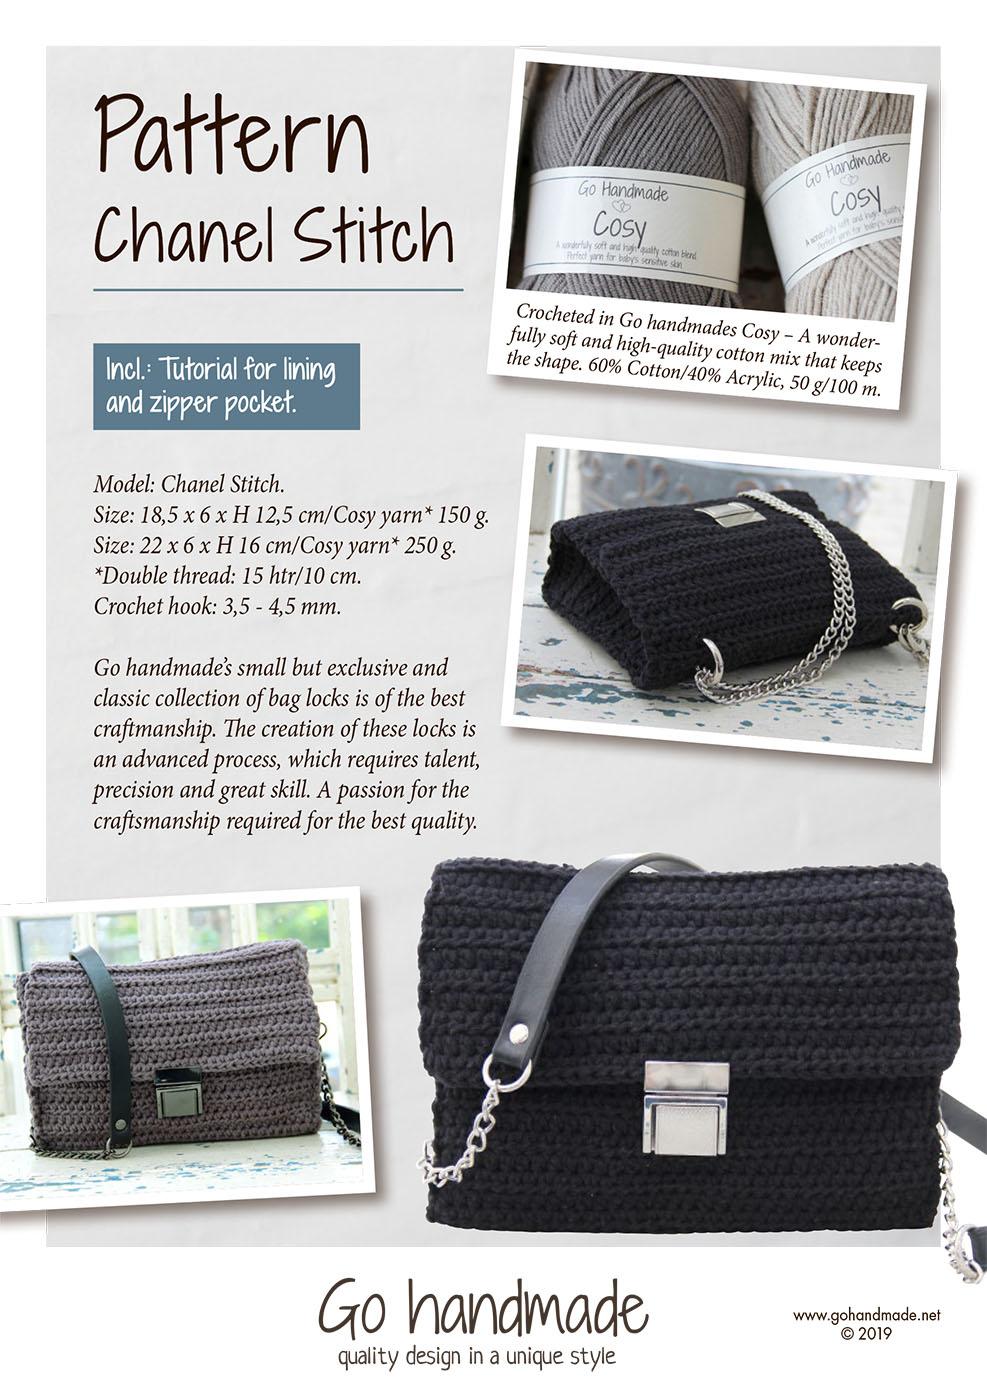 1579b4dff9b7 Chanel Stitch - UK - Crocheted handbags, trays & baskets - Go Handmade